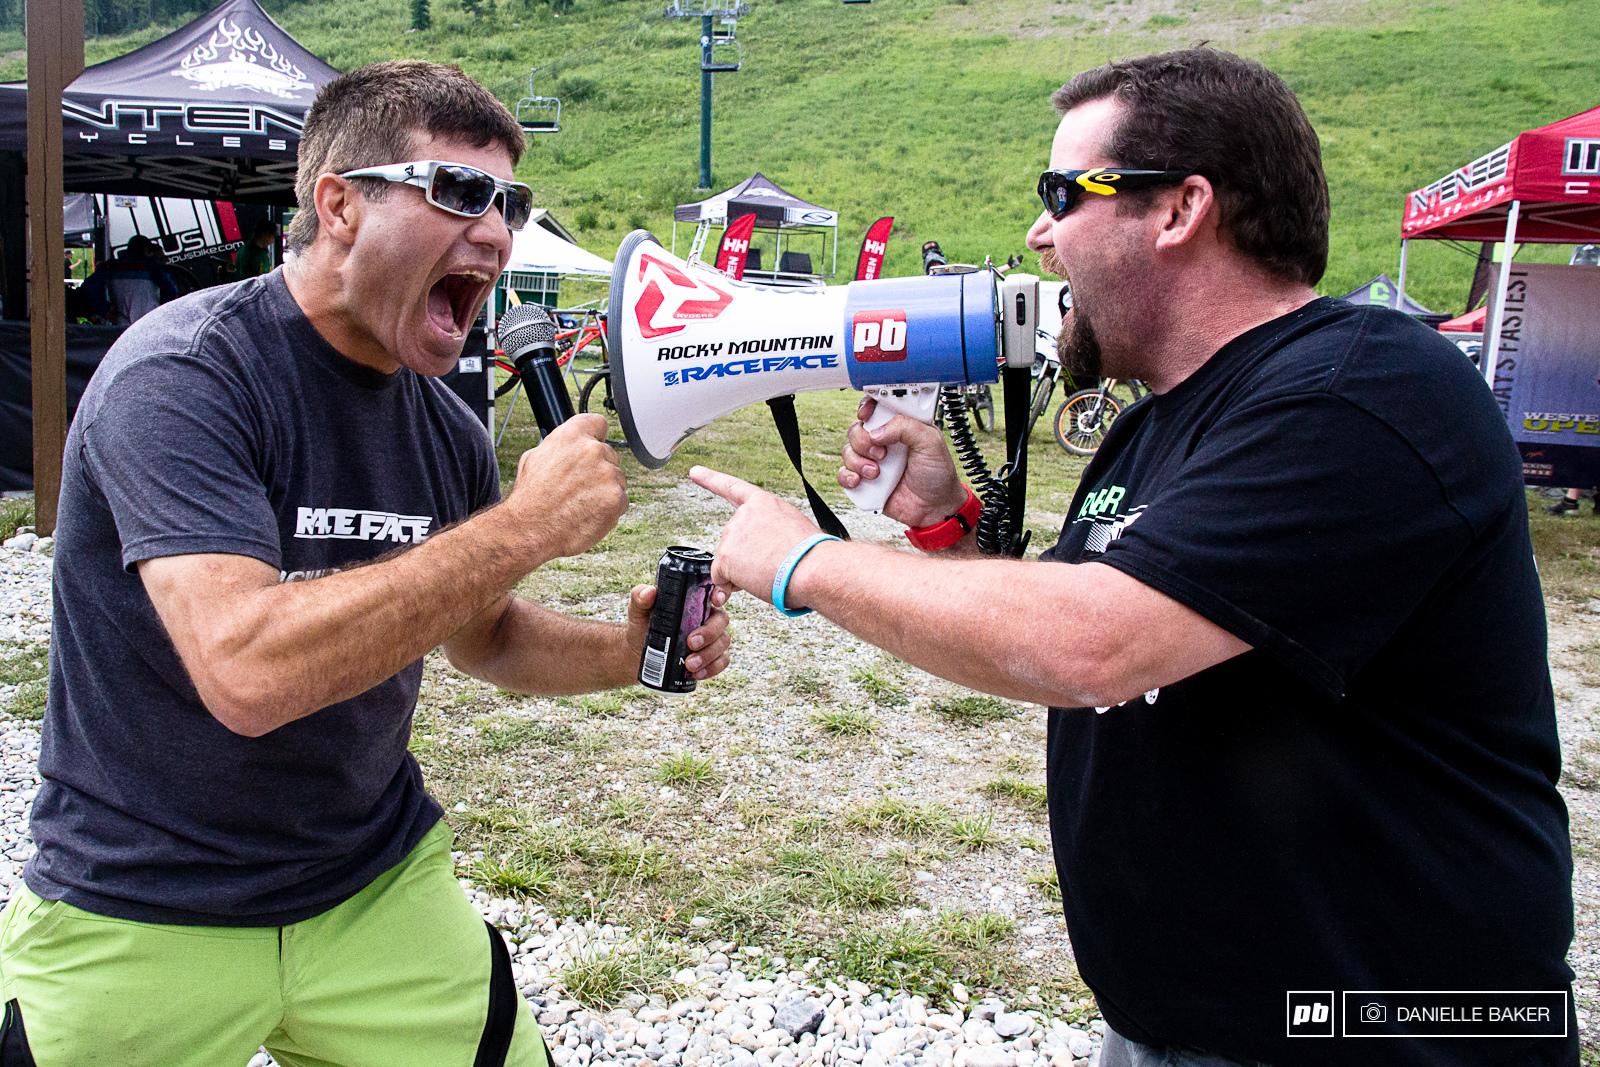 Tippie gets loud with event organizer Stephen Exley.